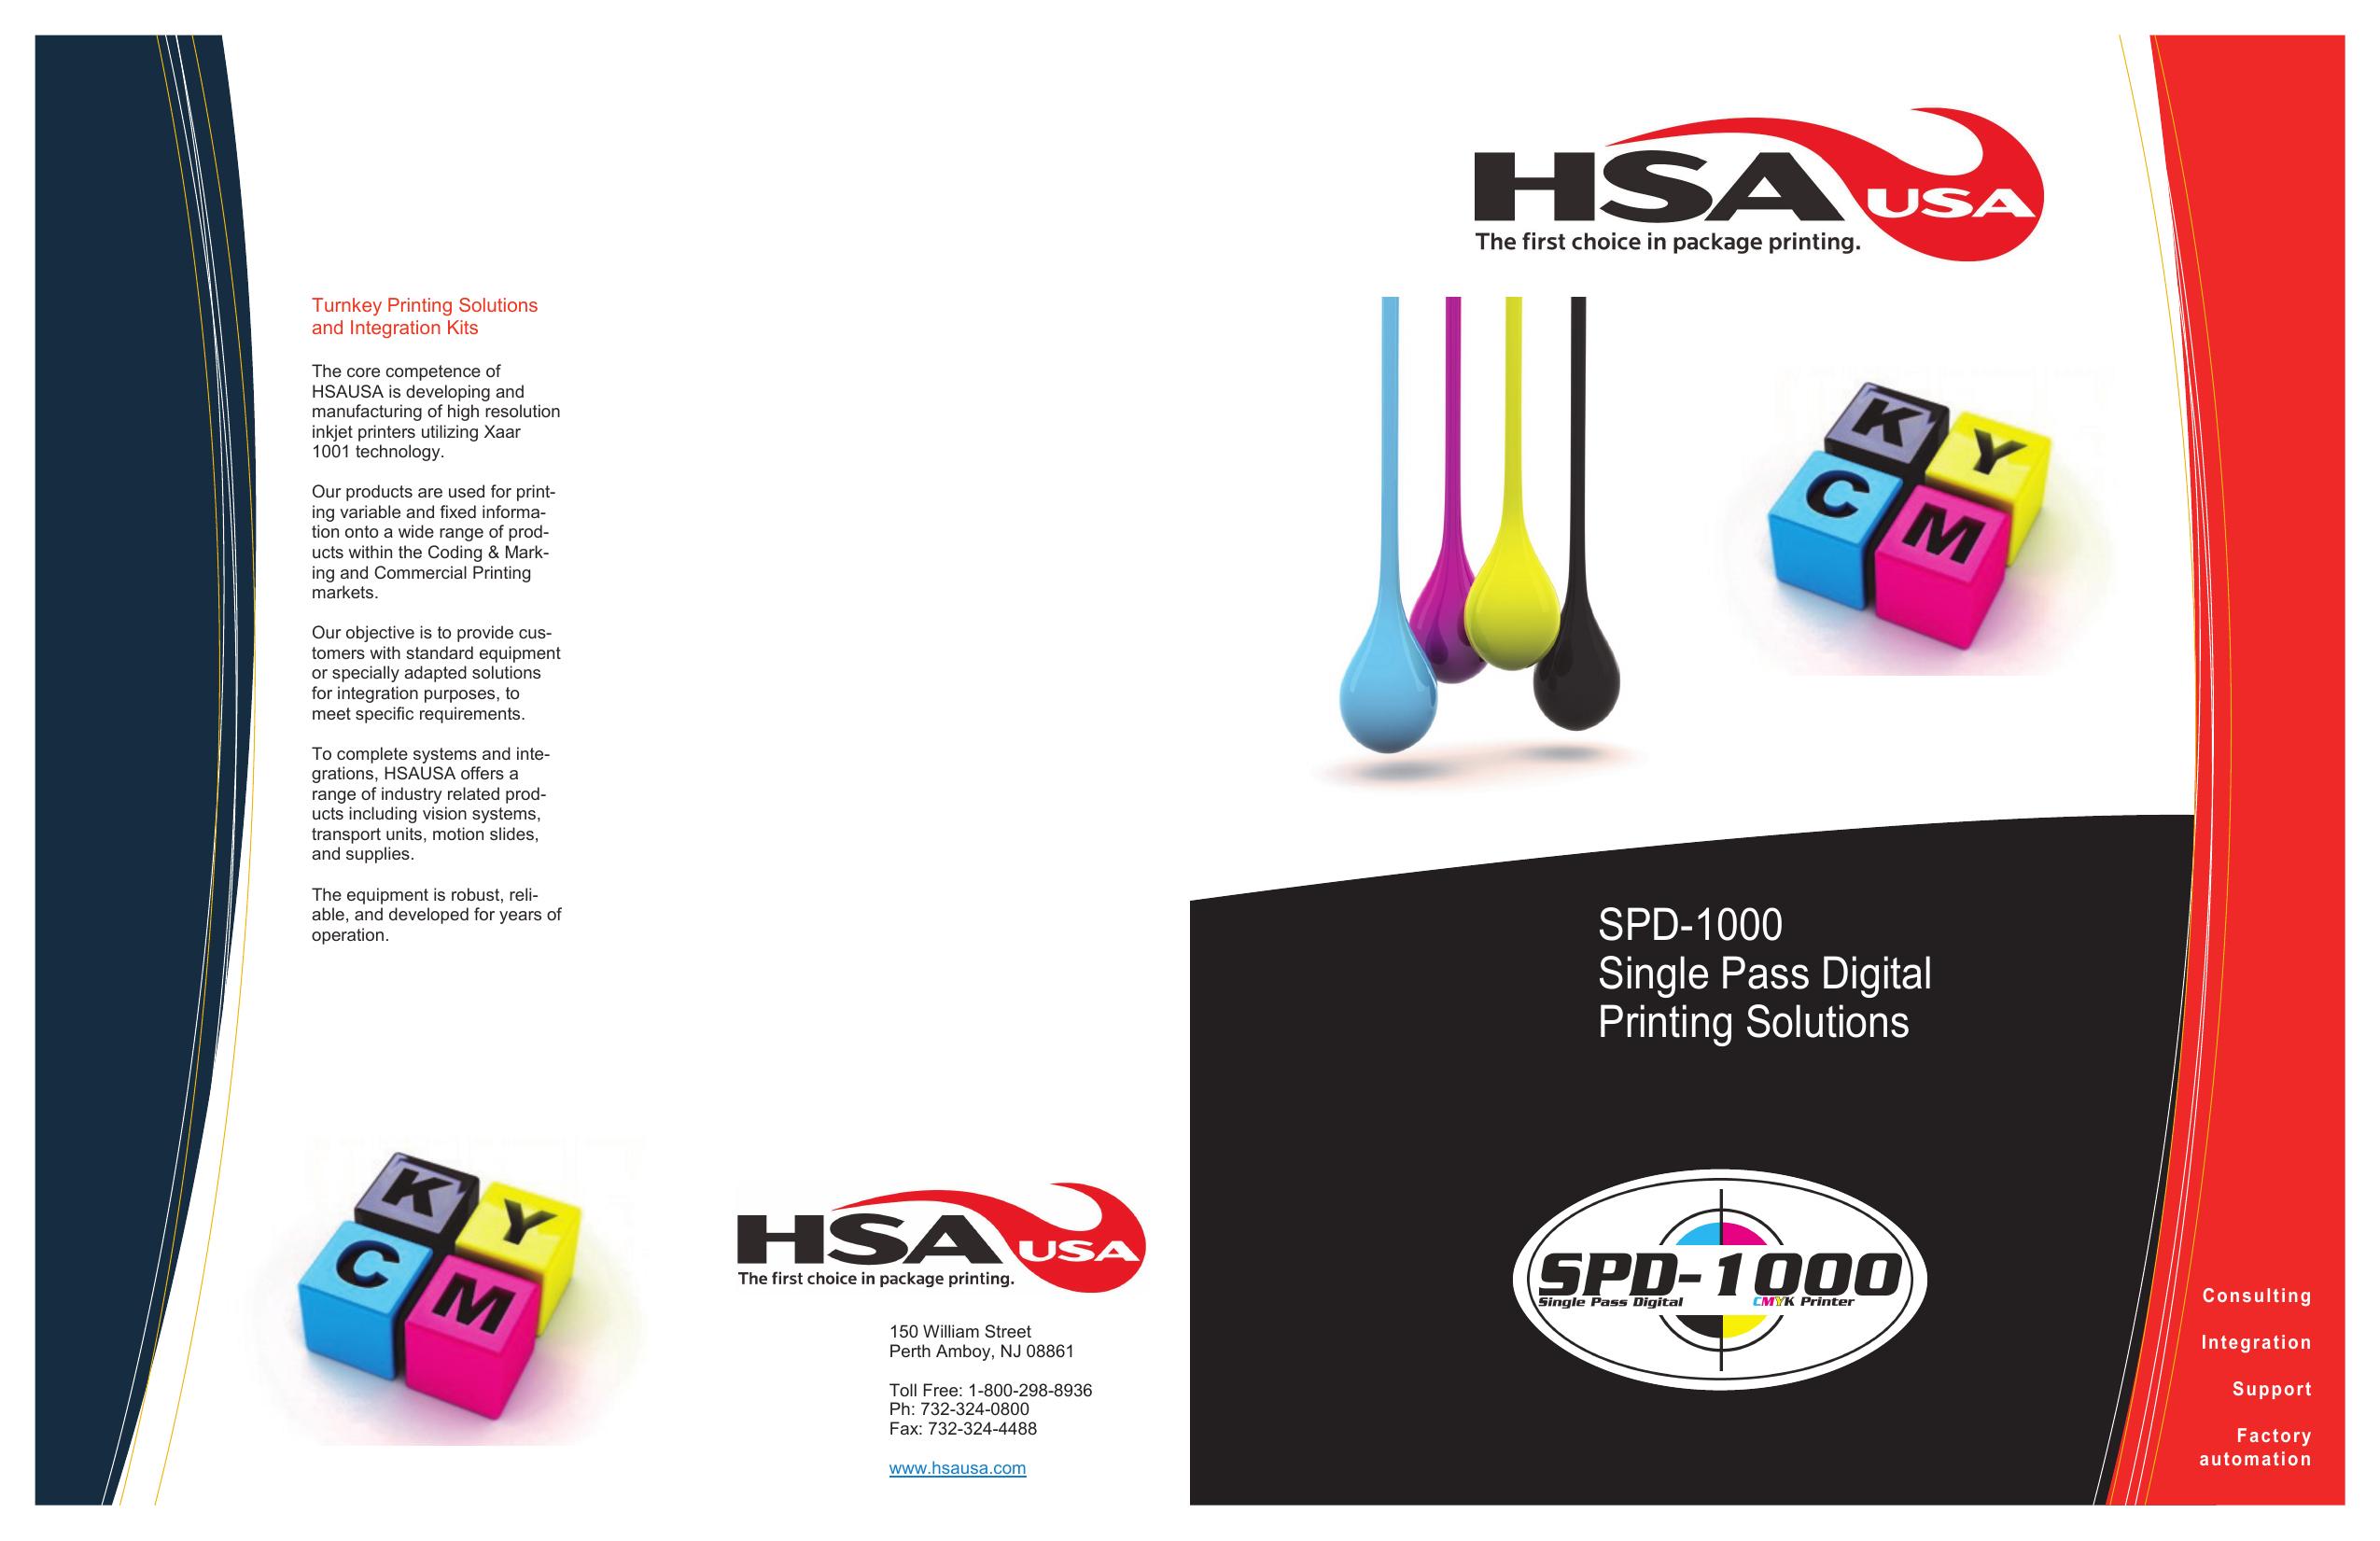 SPD-1000 Single Pass Digital Printing Solutions